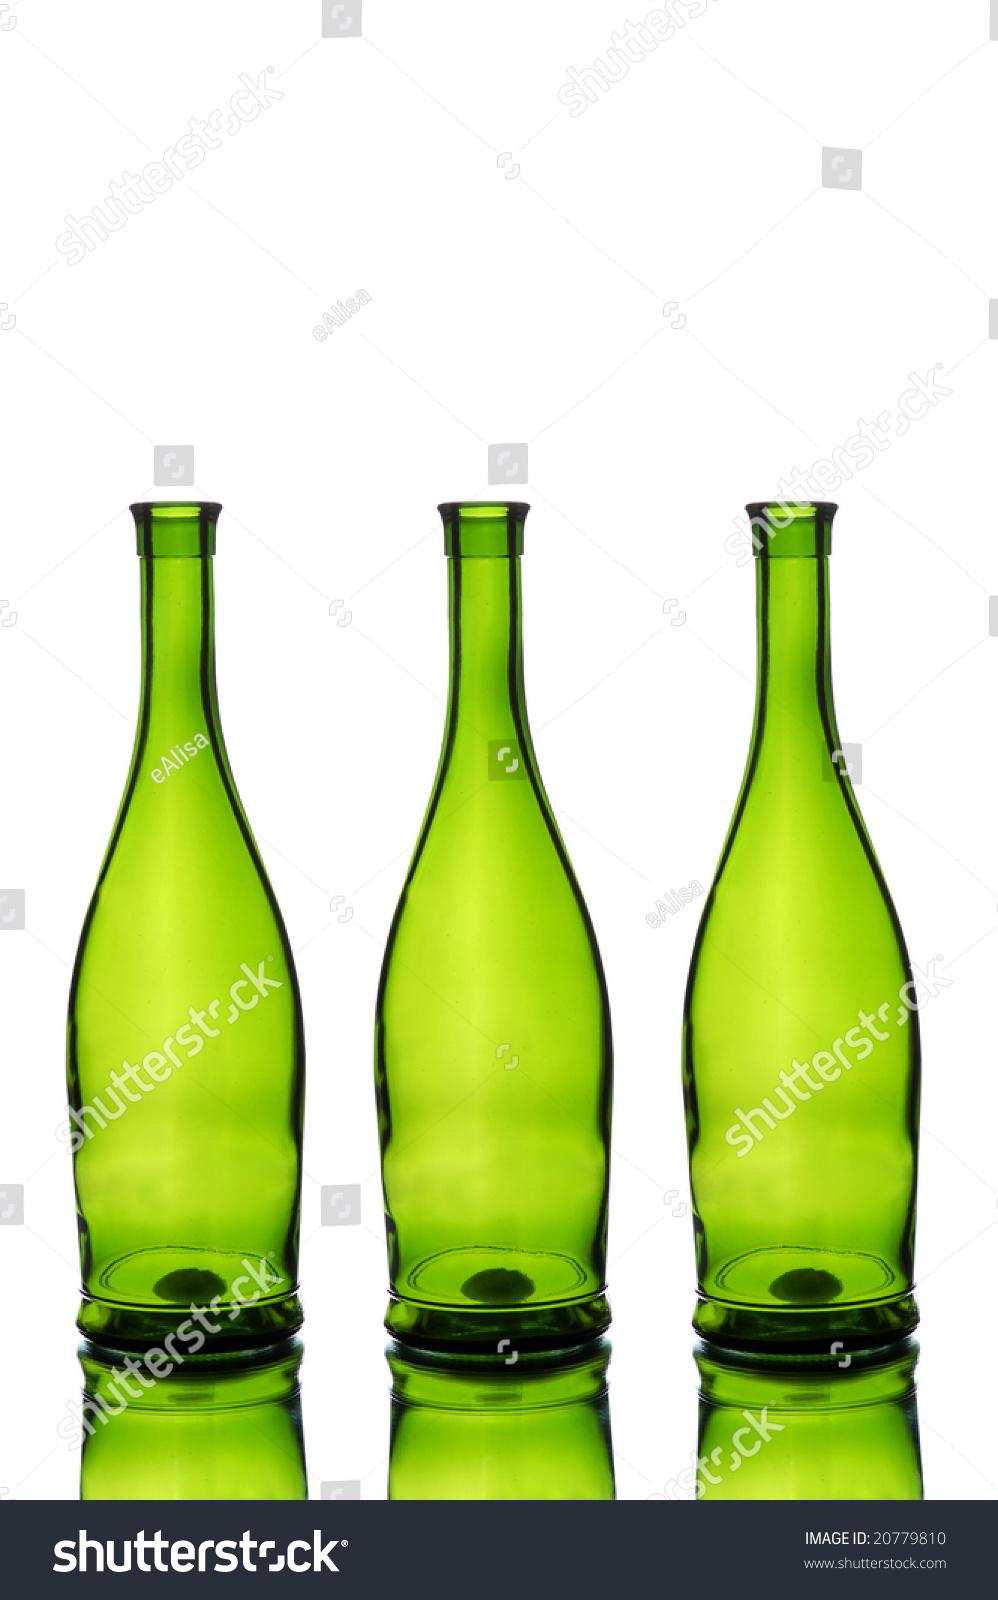 Three green wine bottles isolated on white stock photo for Green wine bottles